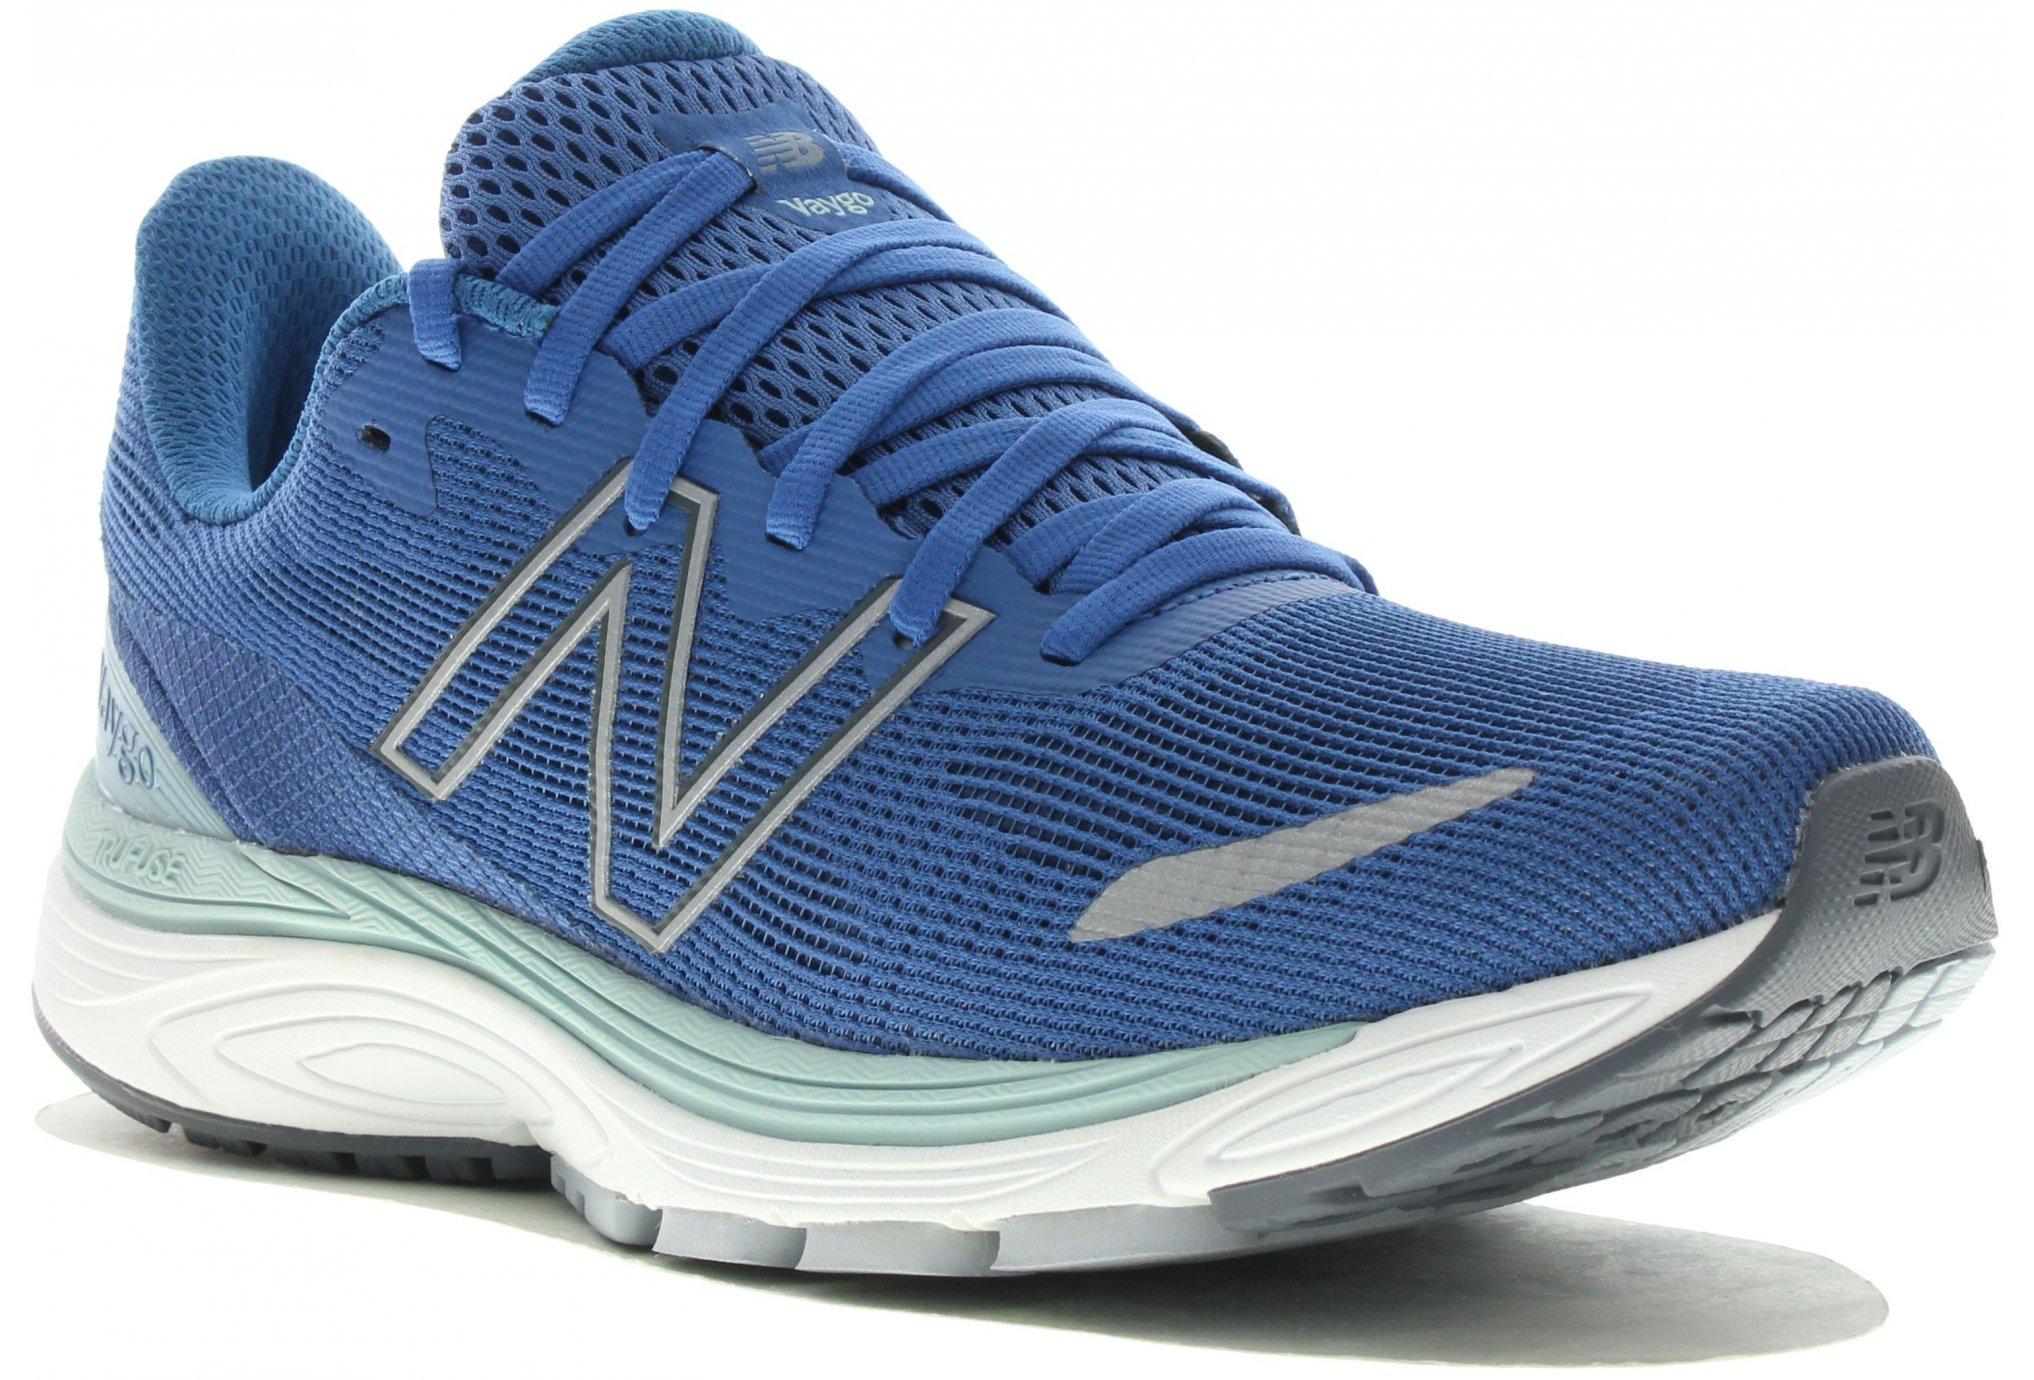 New Balance Vaygo V2 M Chaussures homme